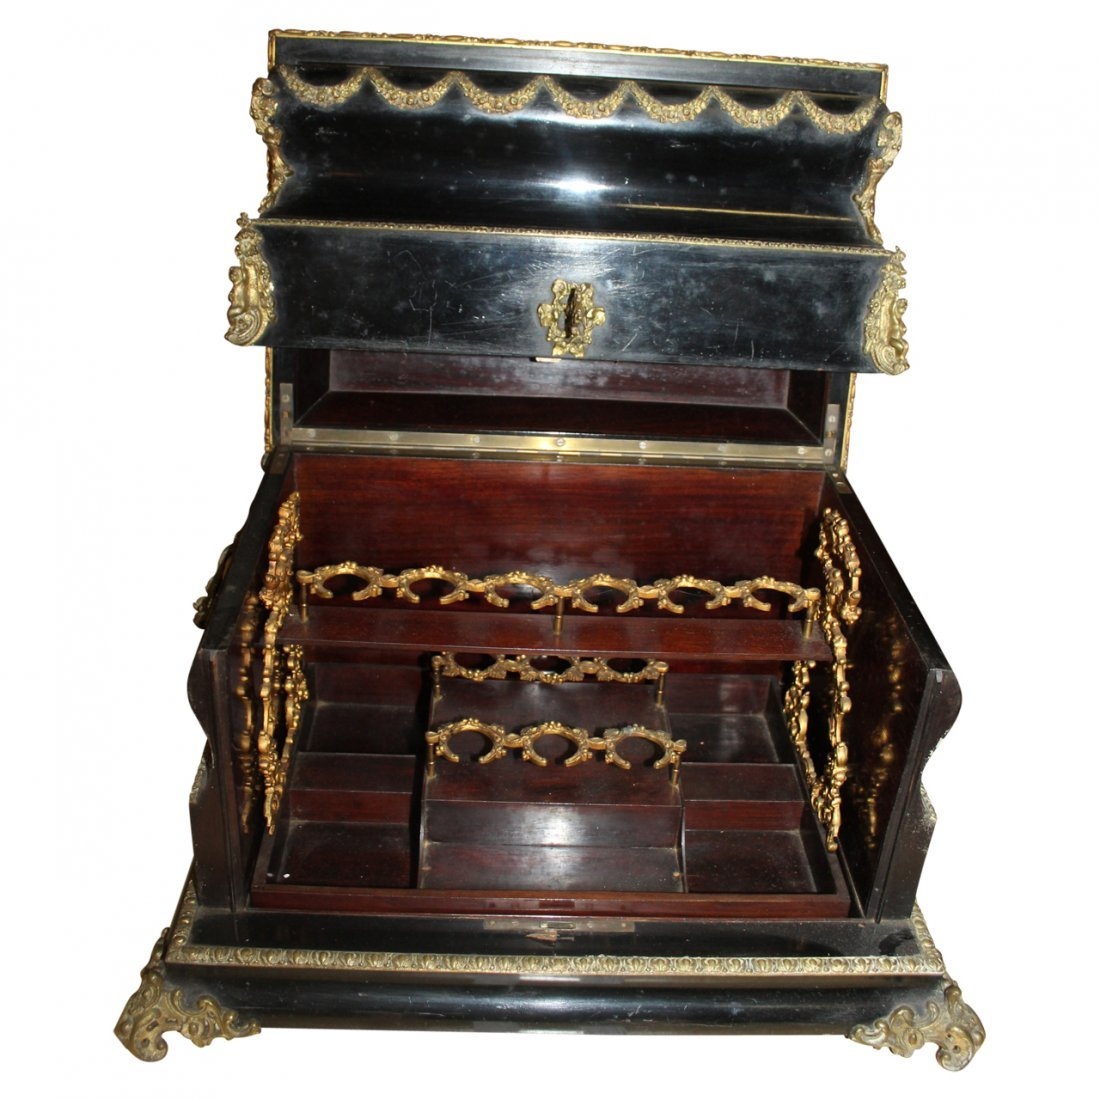 Antique French Hardstone Liquor Casket - 2